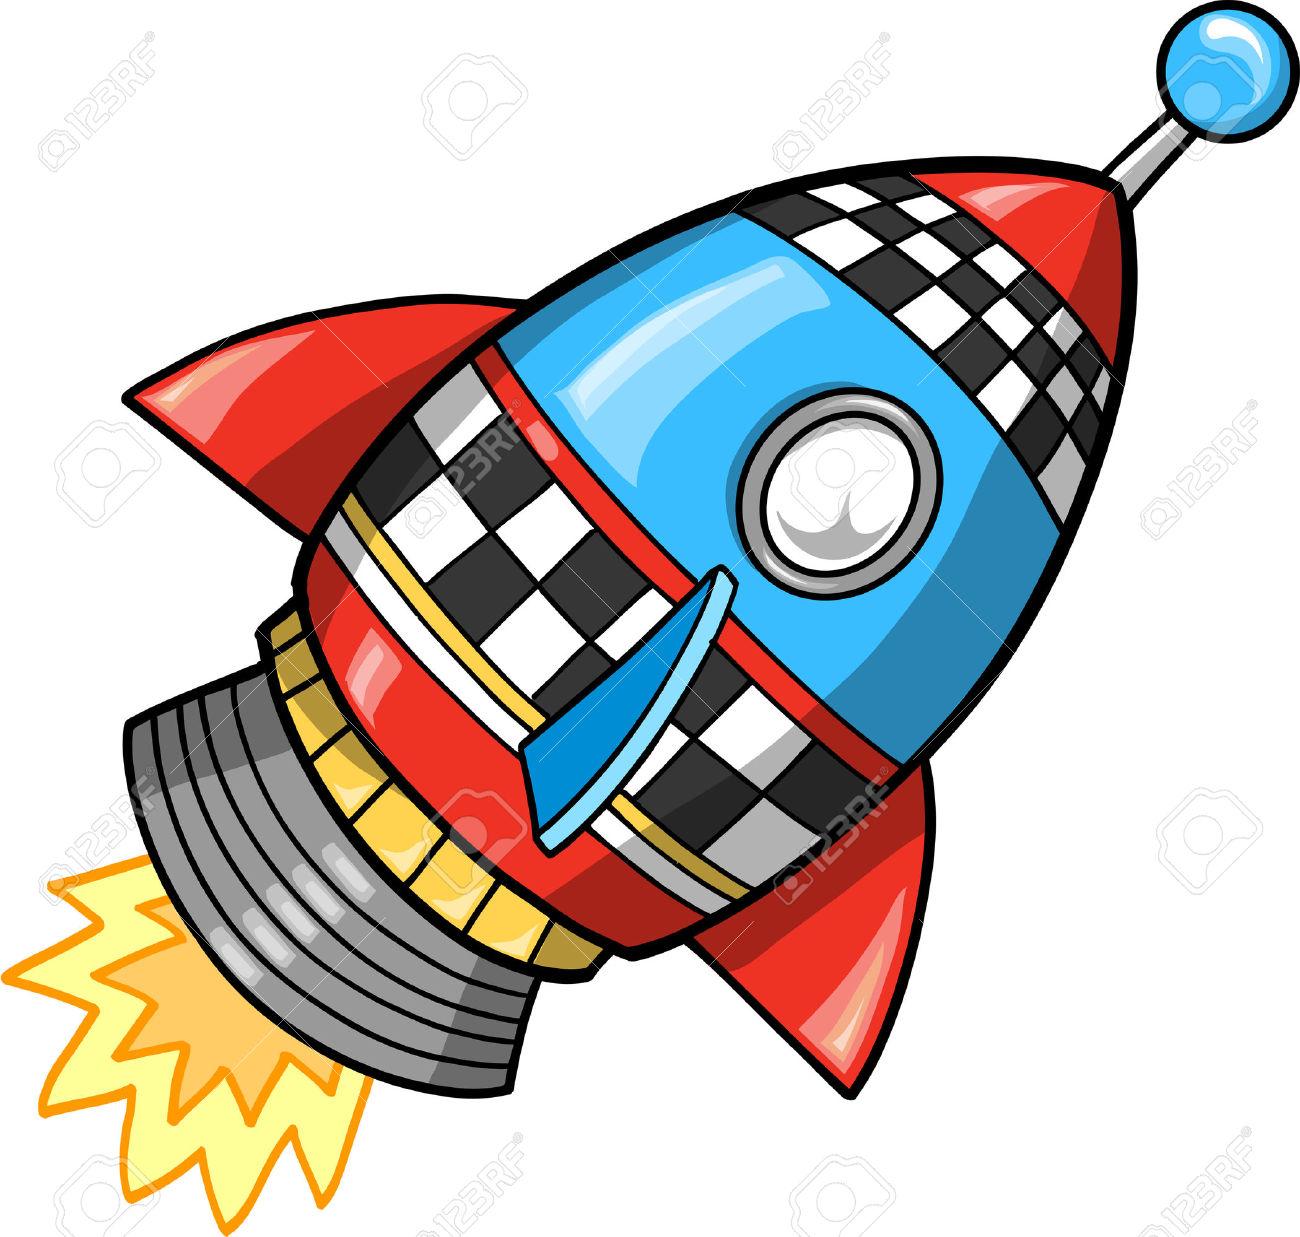 Cliparts free download best. Spaceship clipart spacecraft